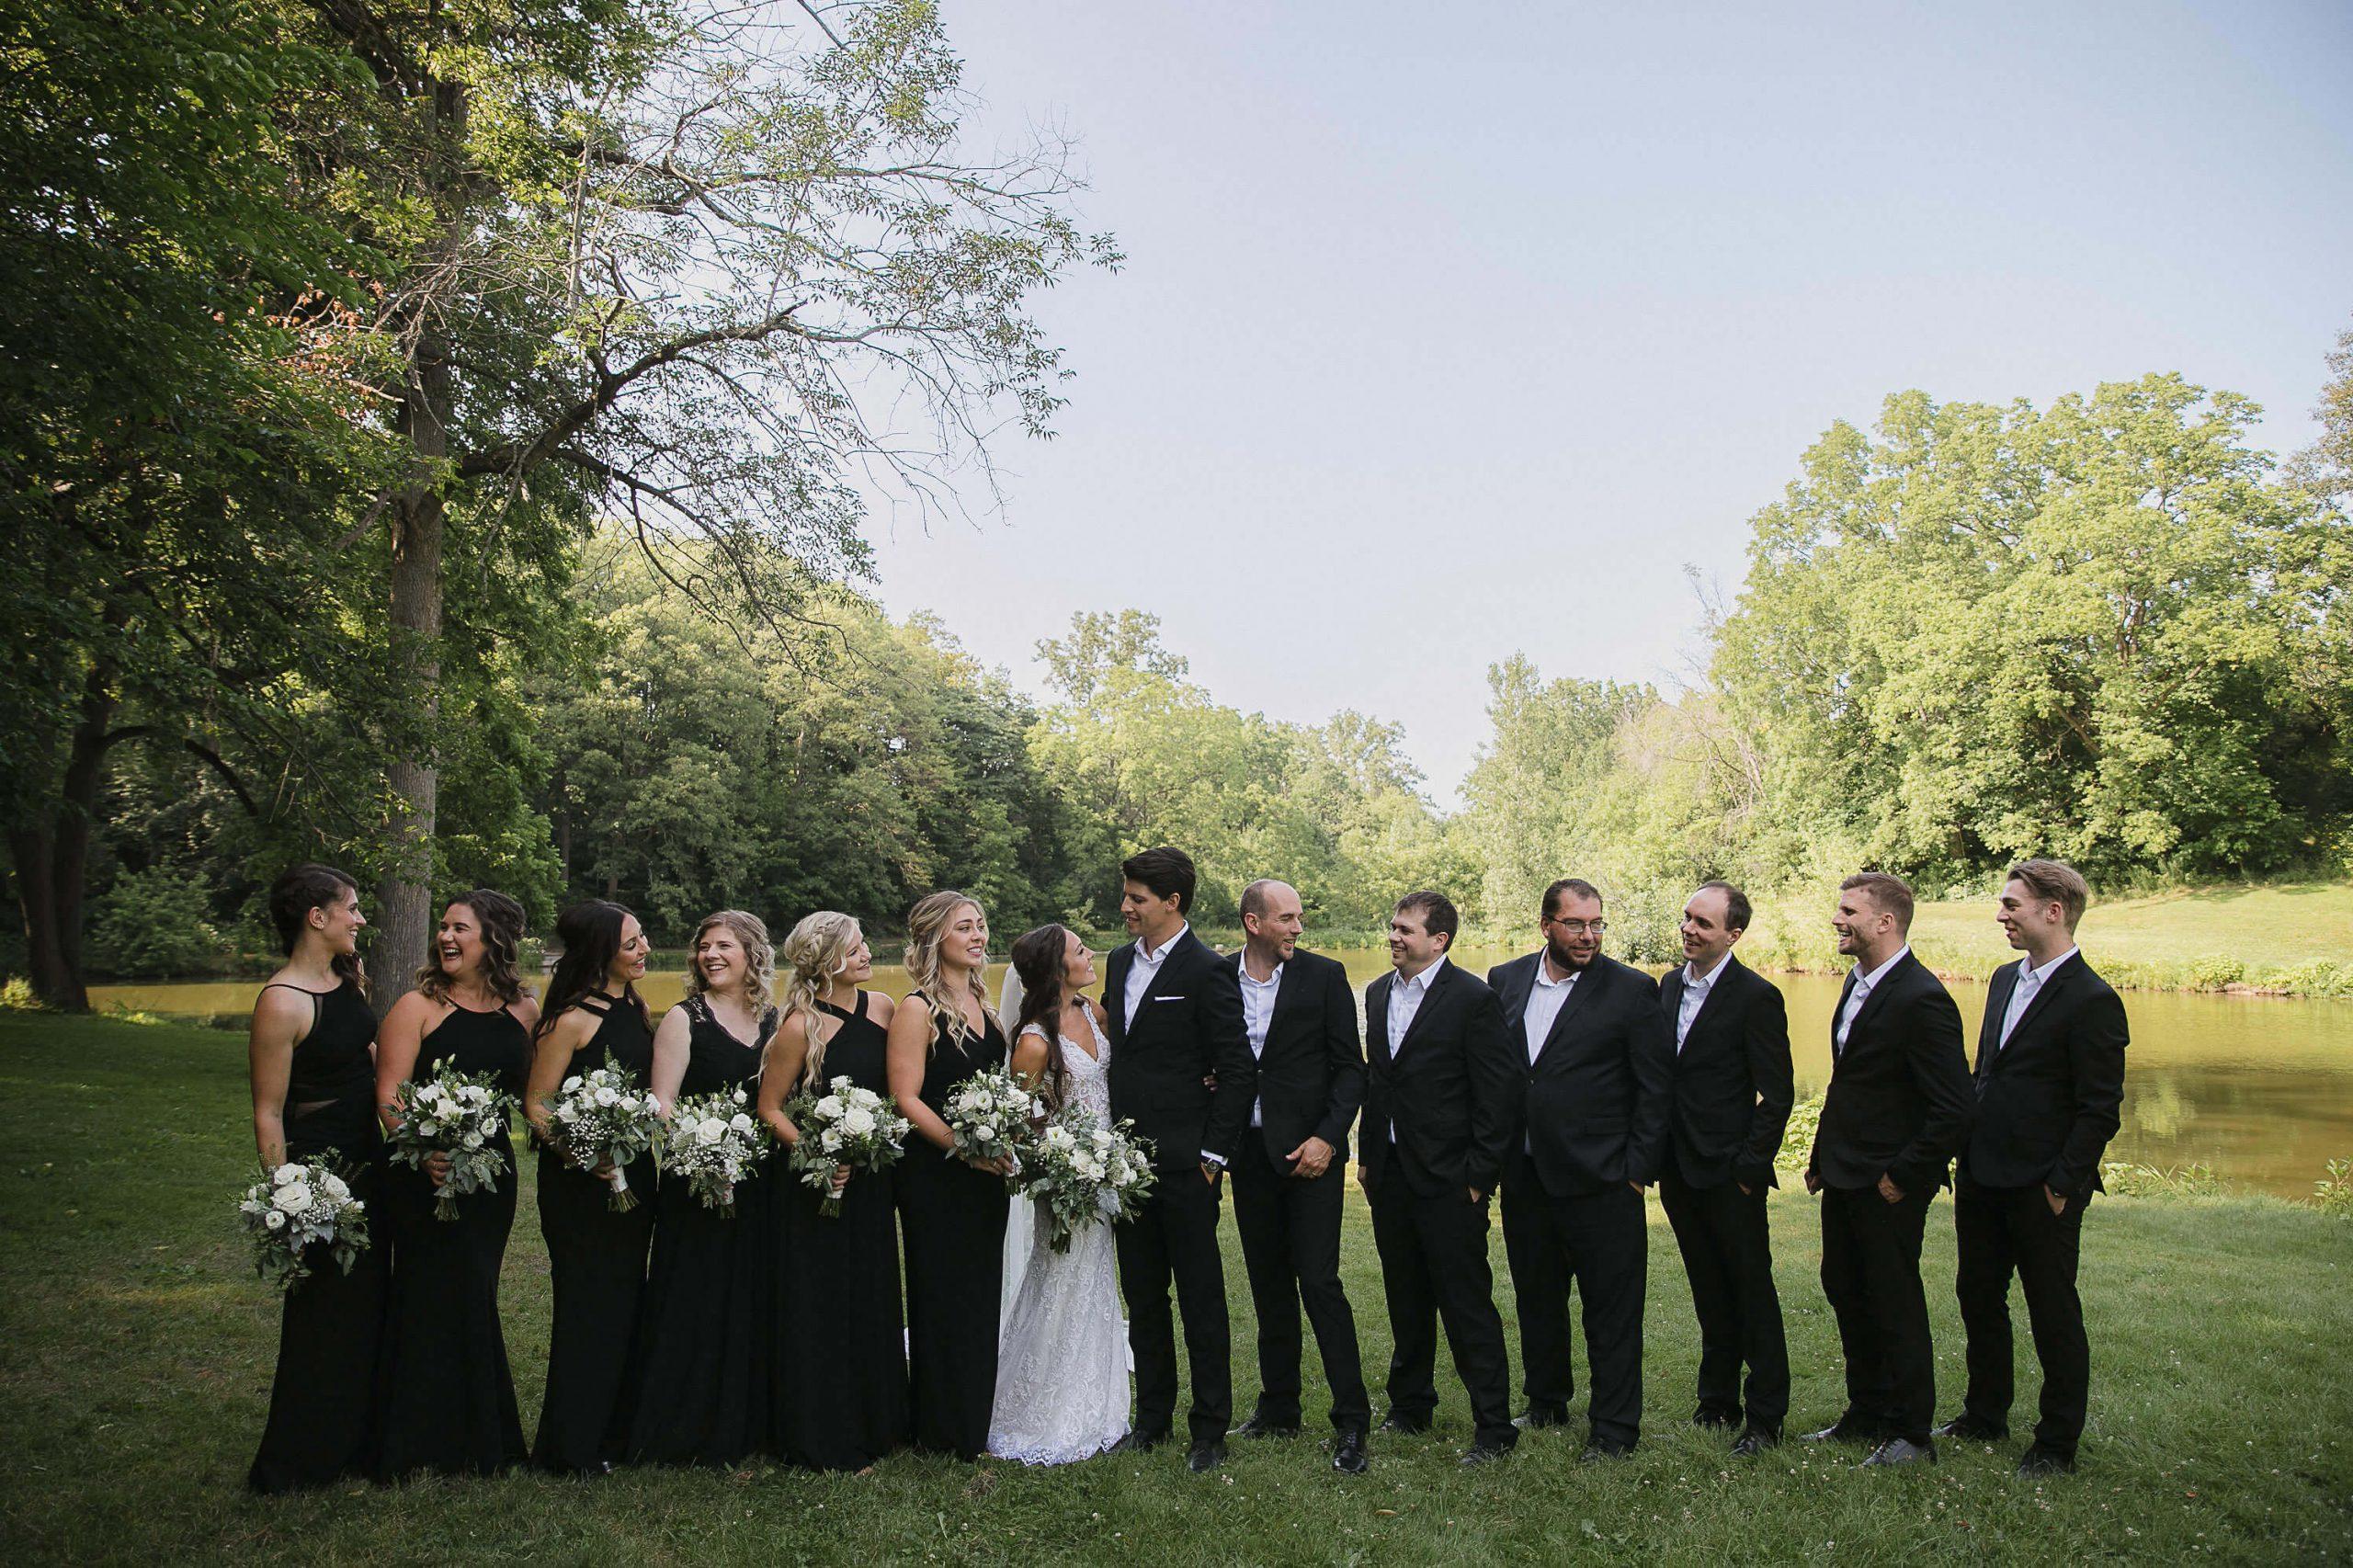 Wedding photo bridal party pond public park, all black wedding, black bridesmaid dresses, white and green bouquets